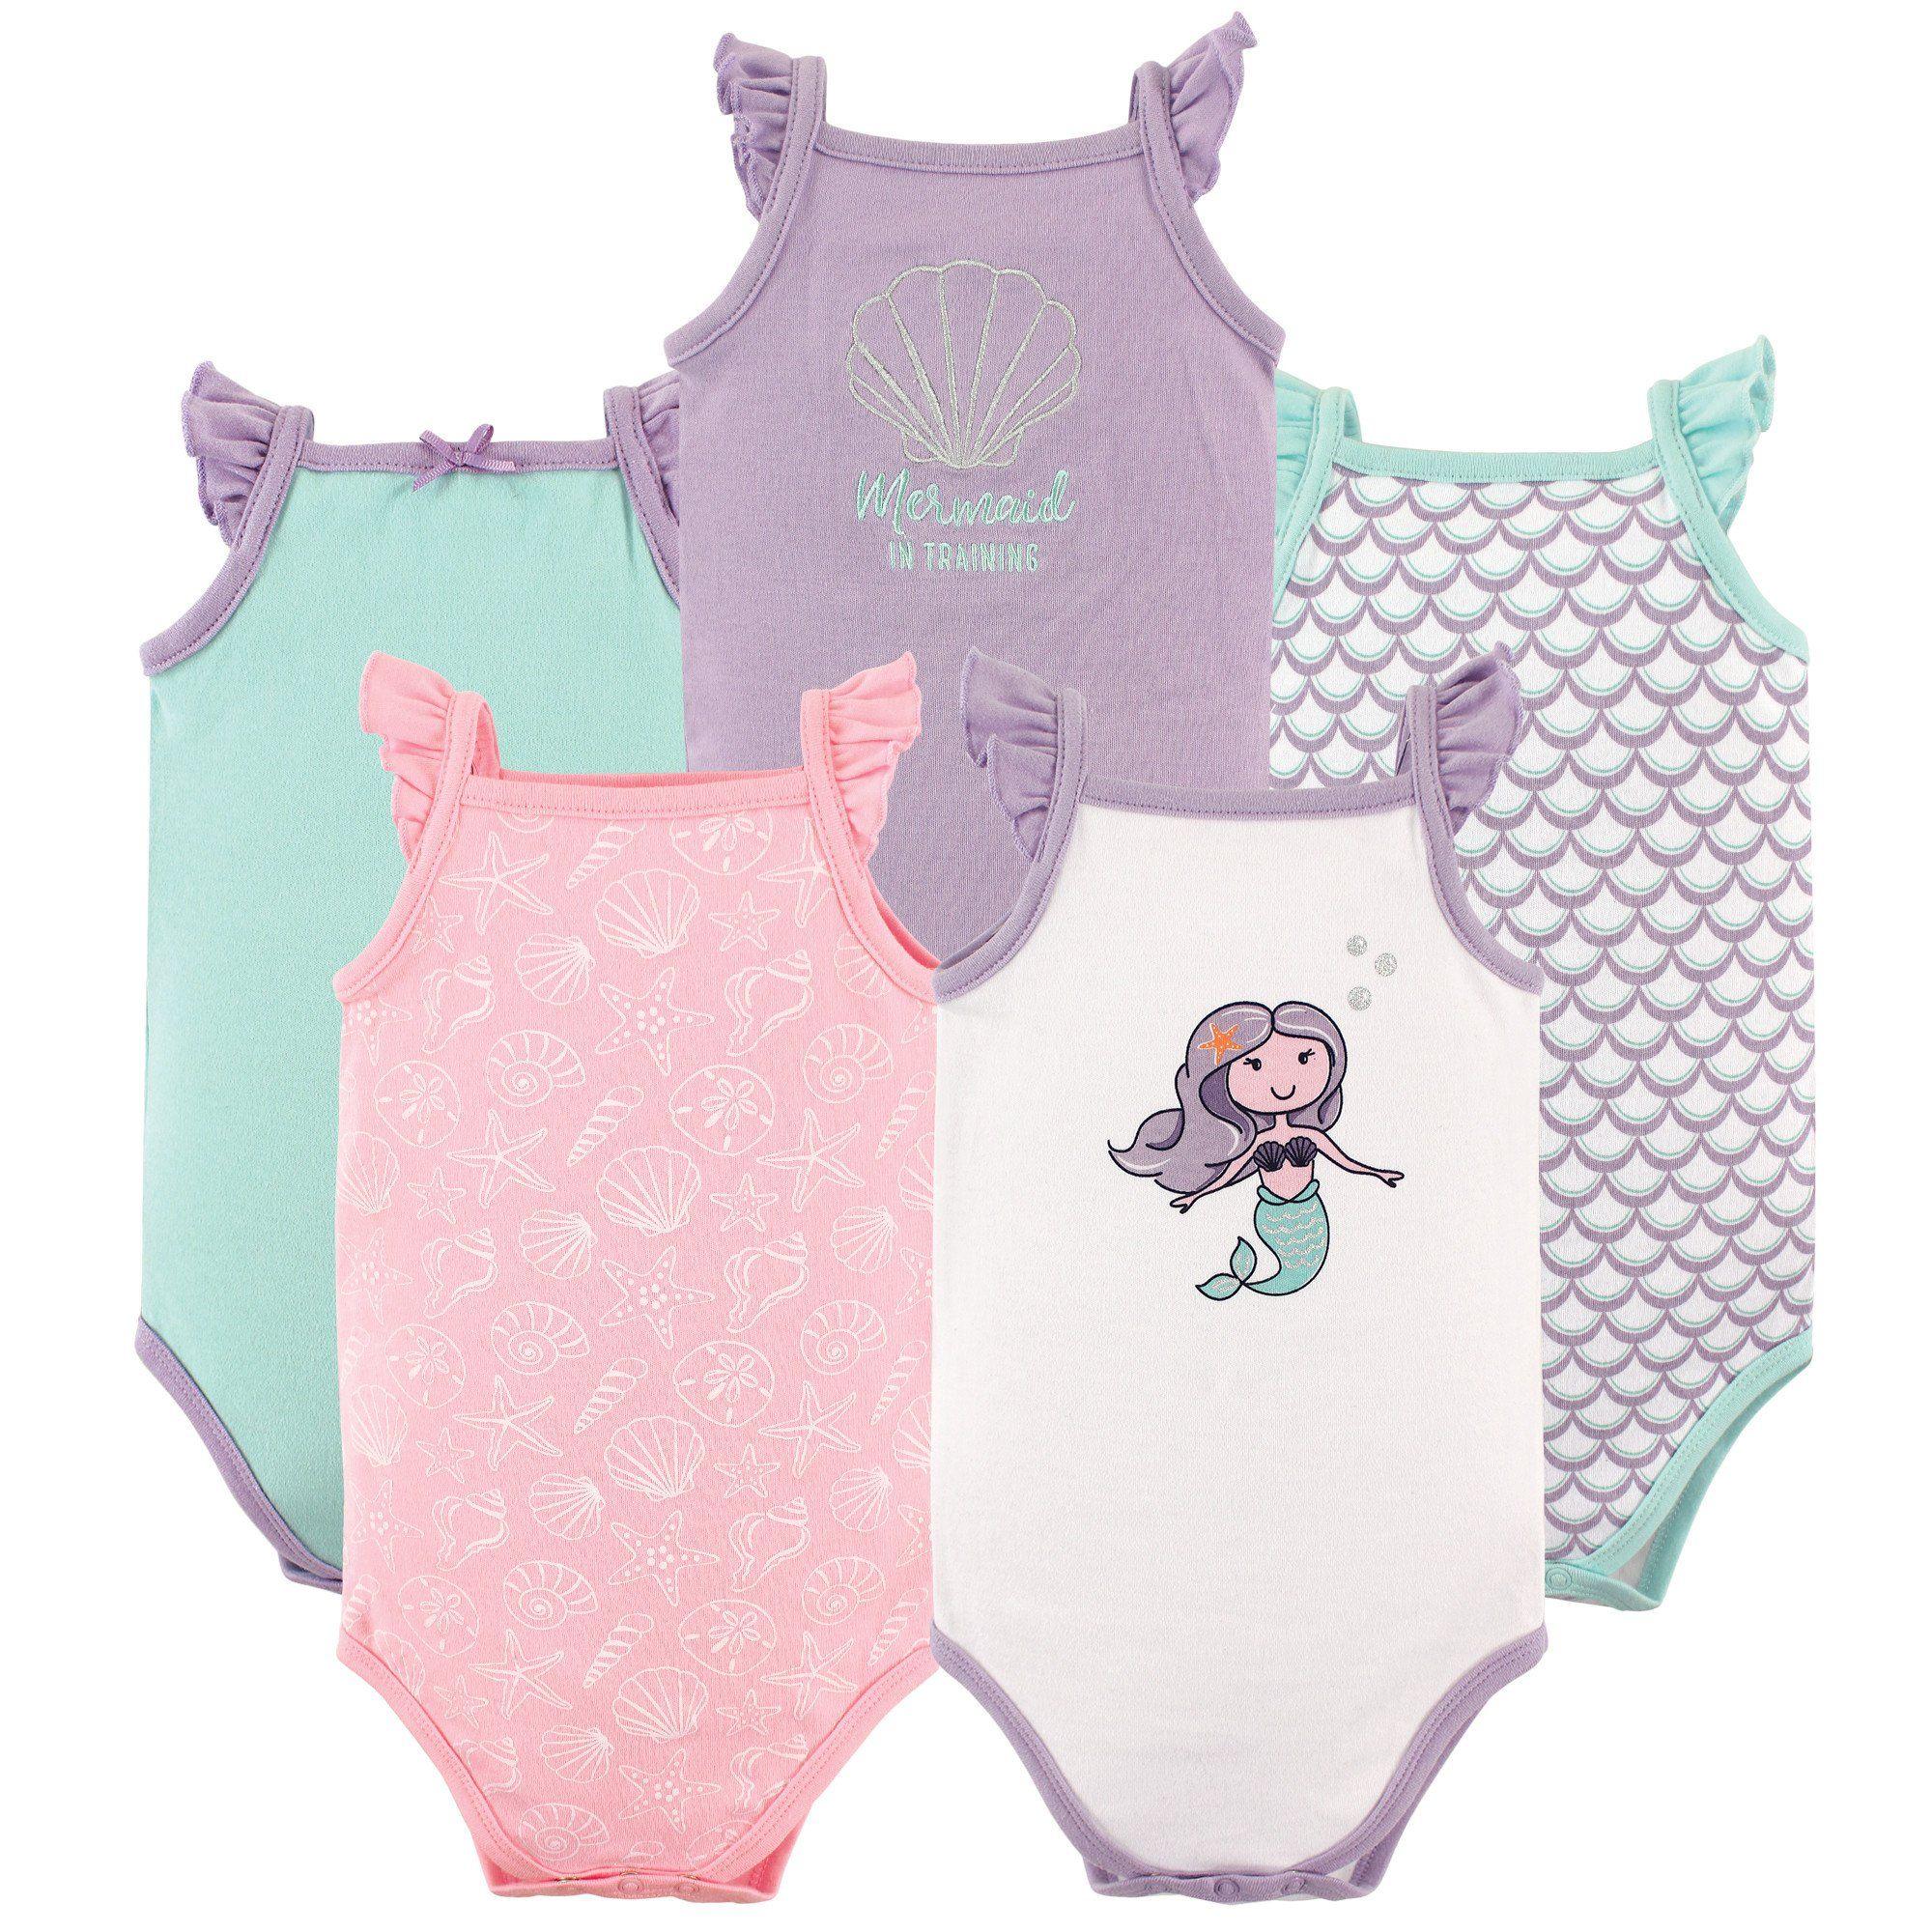 Hudson Baby Baby Sleeveless Bodysuits 5 Pack Mermaid 36 Months